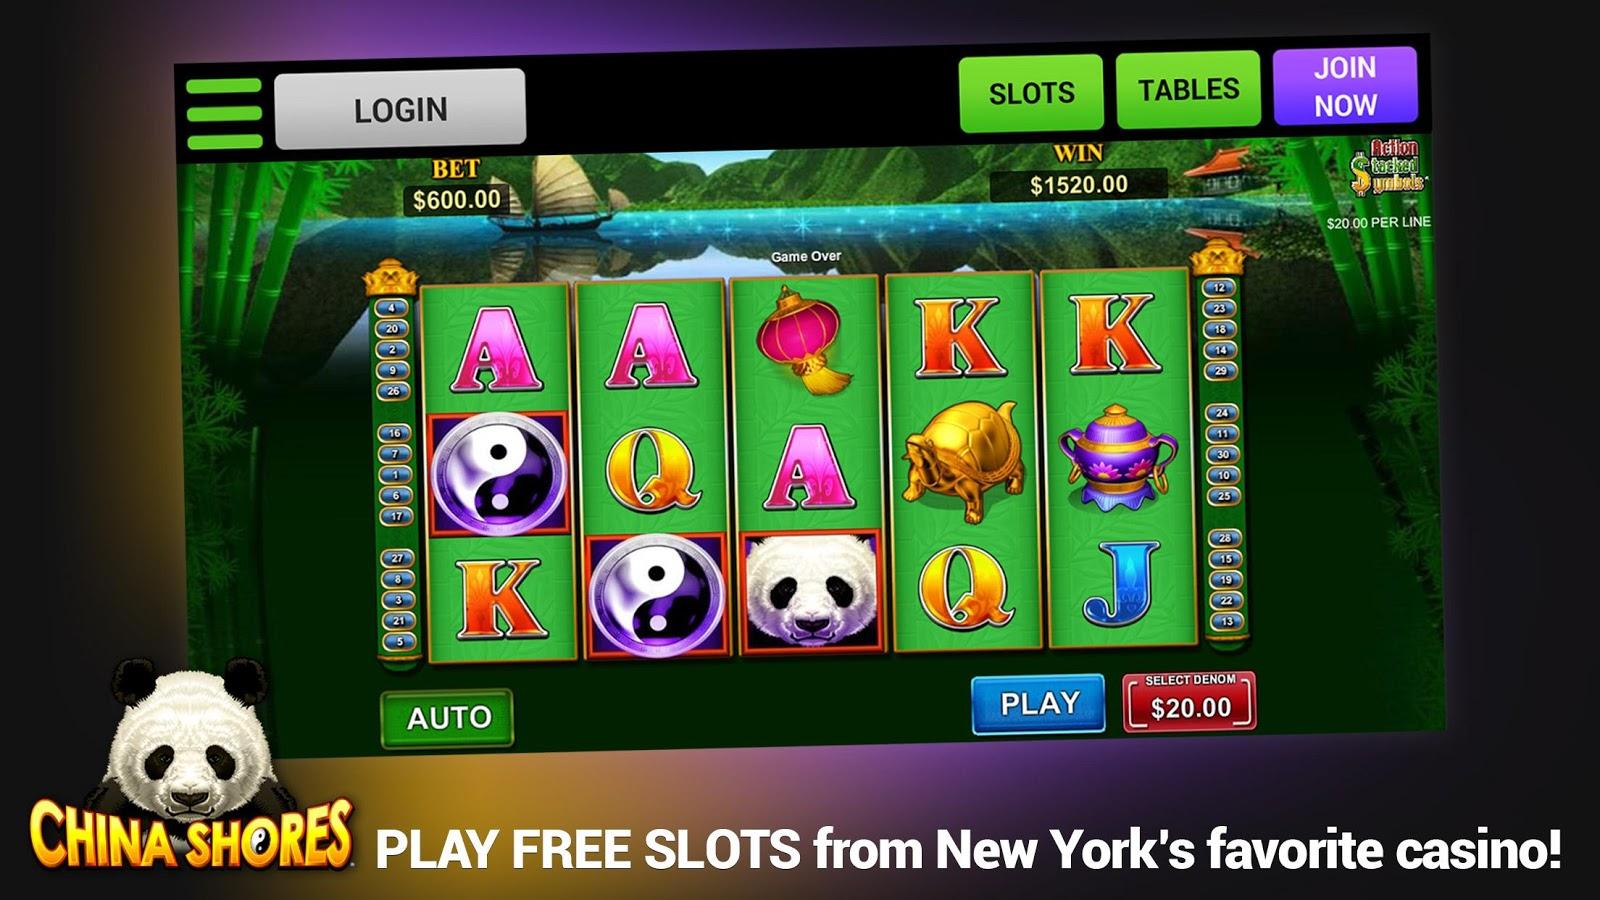 Royal vegas casino gratis casino888 Madrid online - 16845